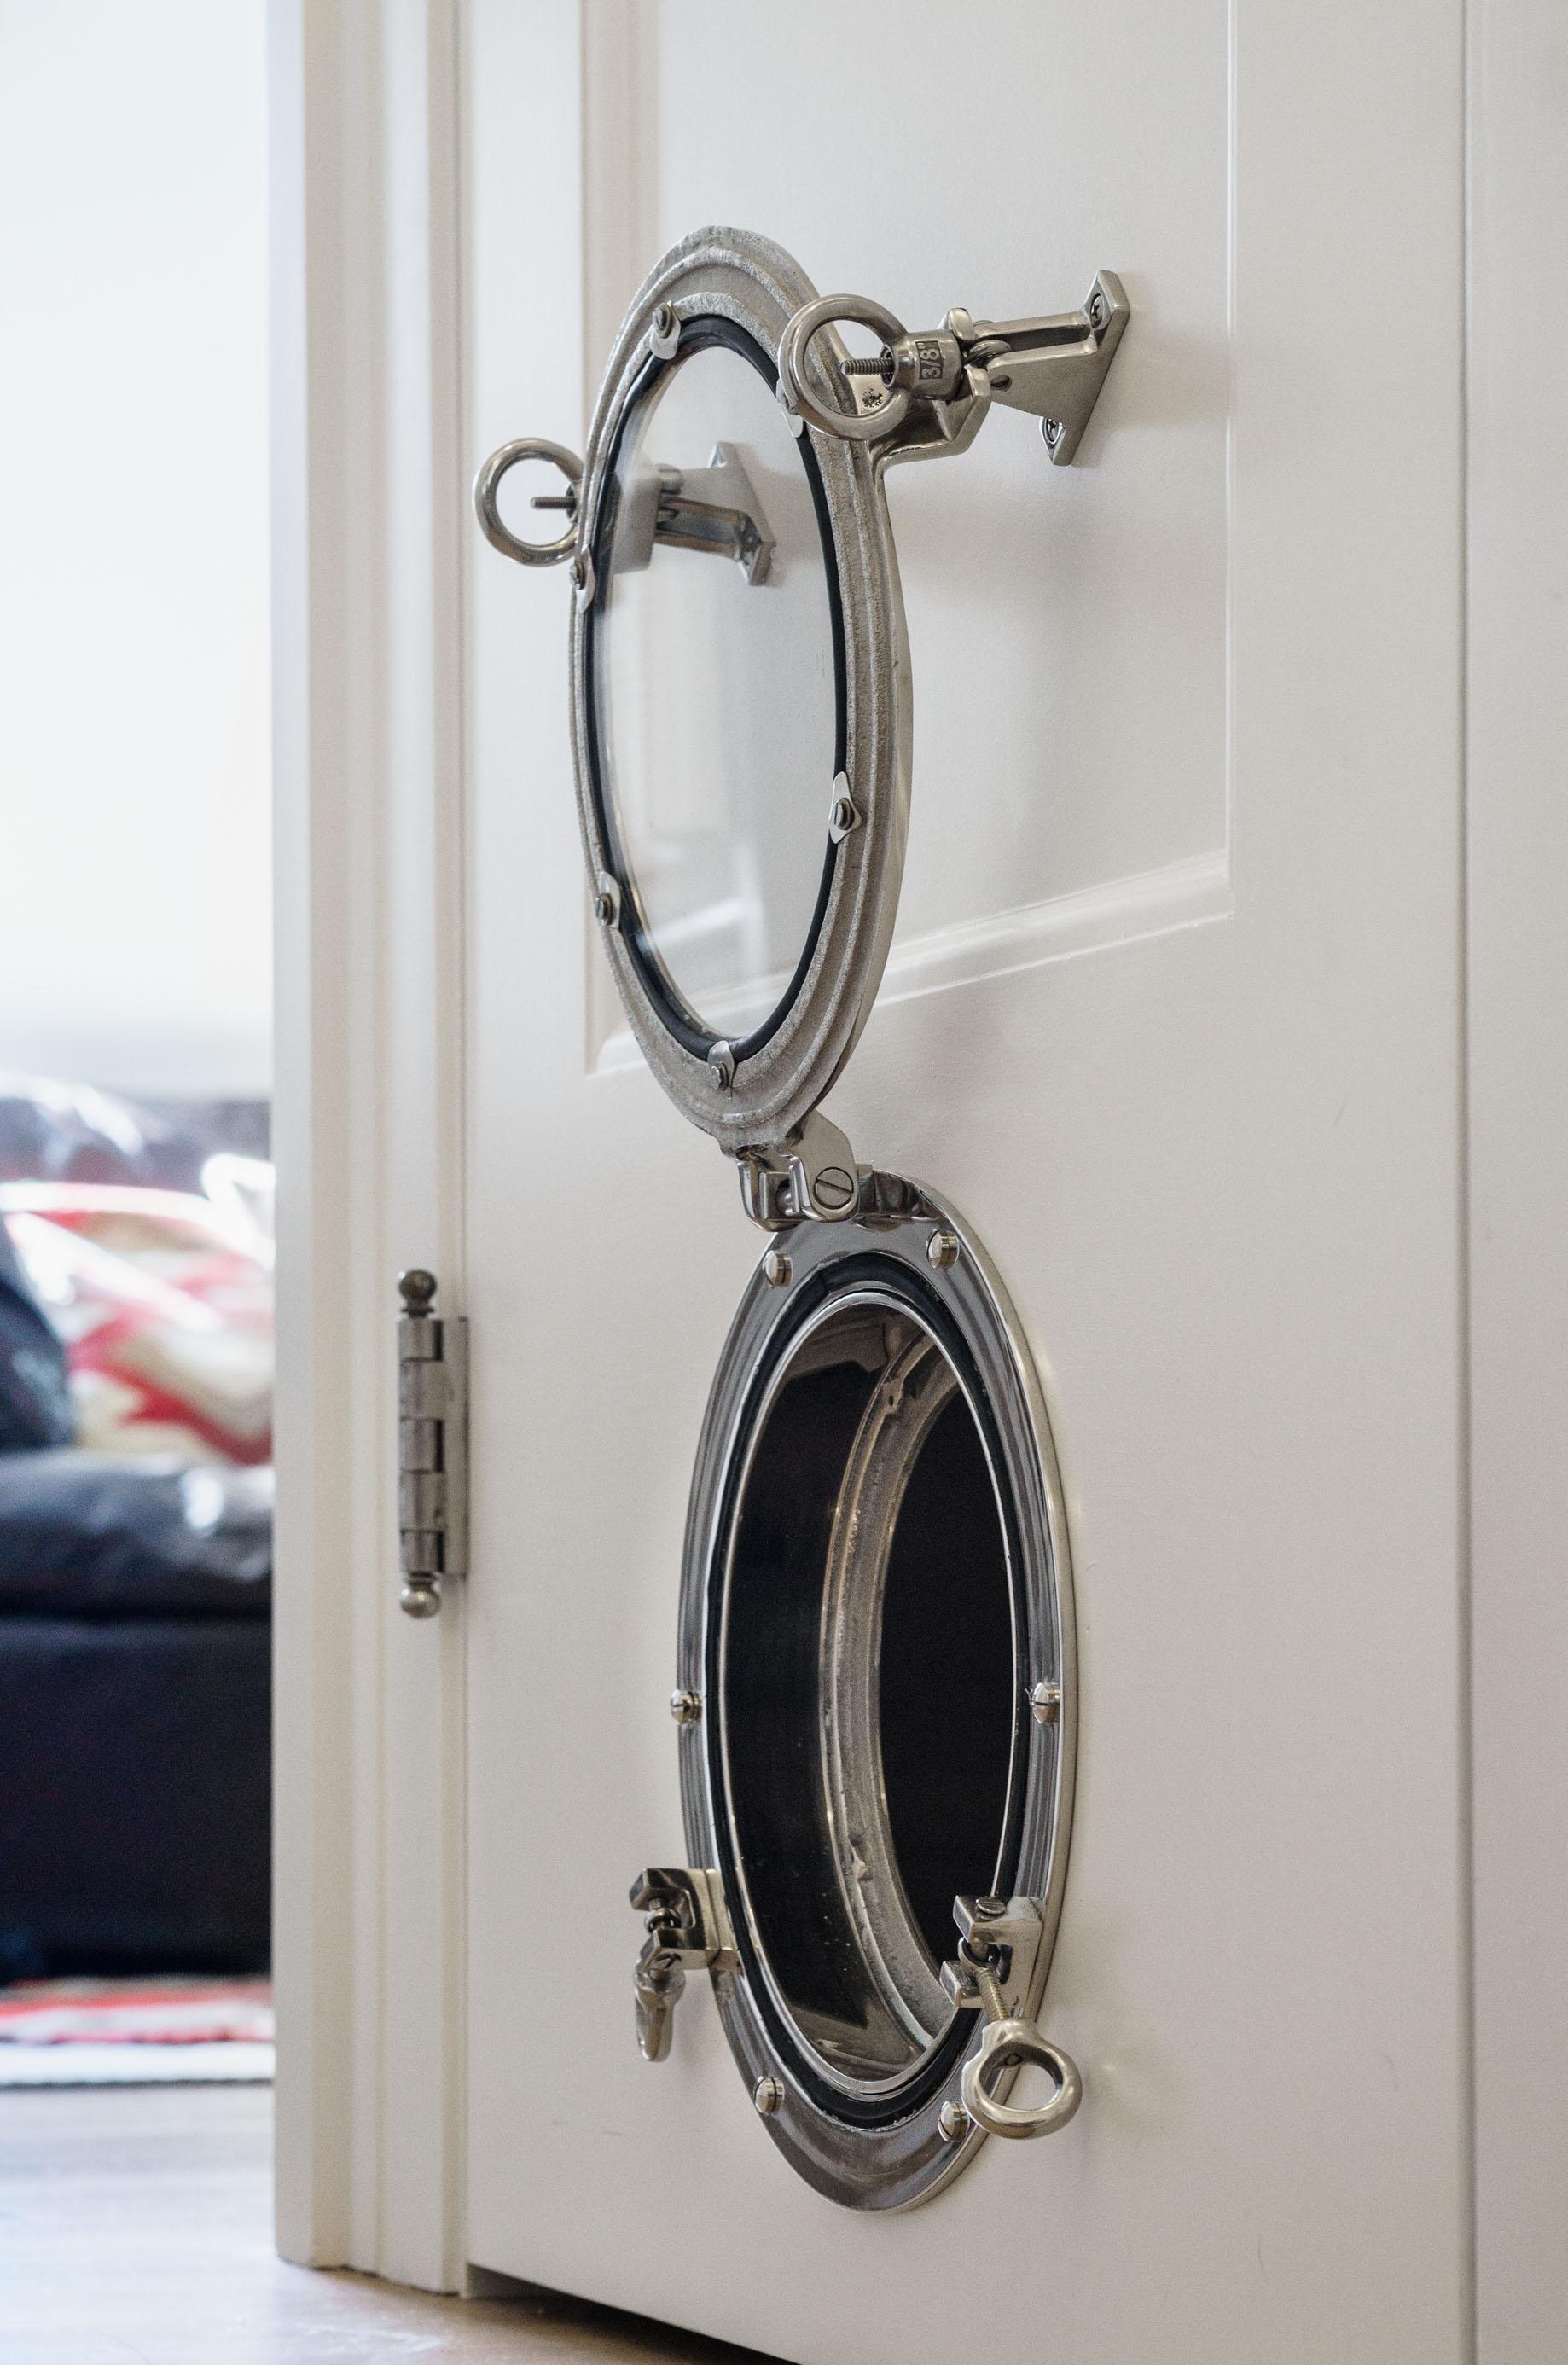 The Porthole pet door.